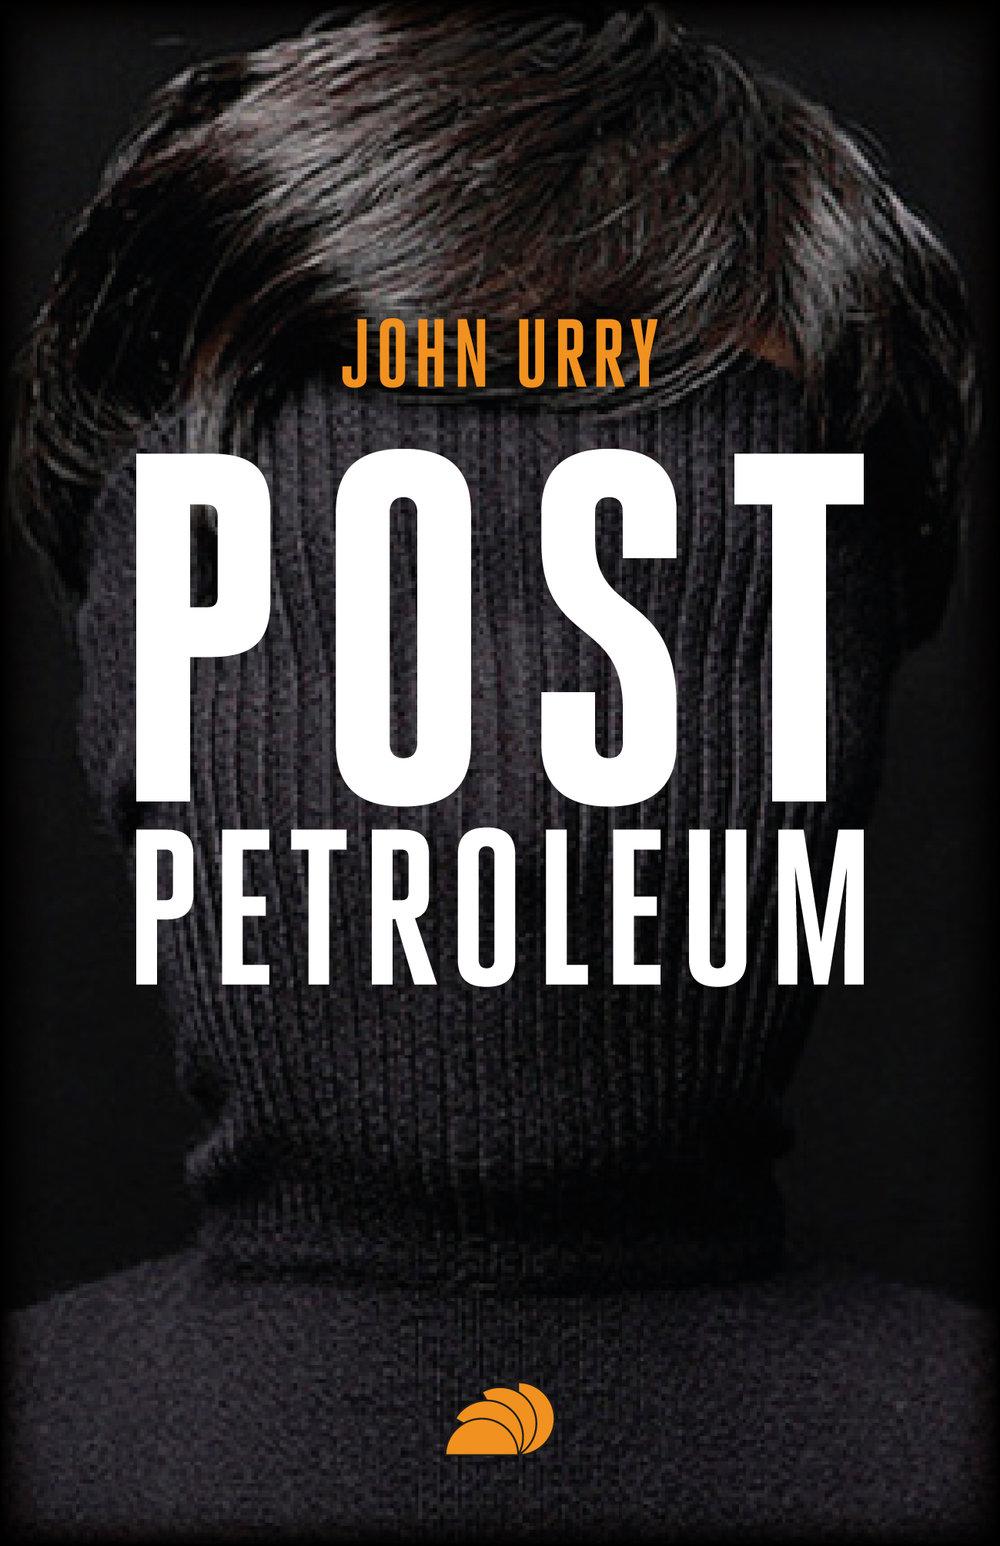 Post PetroleumJohn Urry - Corporate Book Design for French Railways + Think TankSNCF / Forum Vies Mobiles.Client: SNCF / Forum Vies Mobiles / Éditions Loco